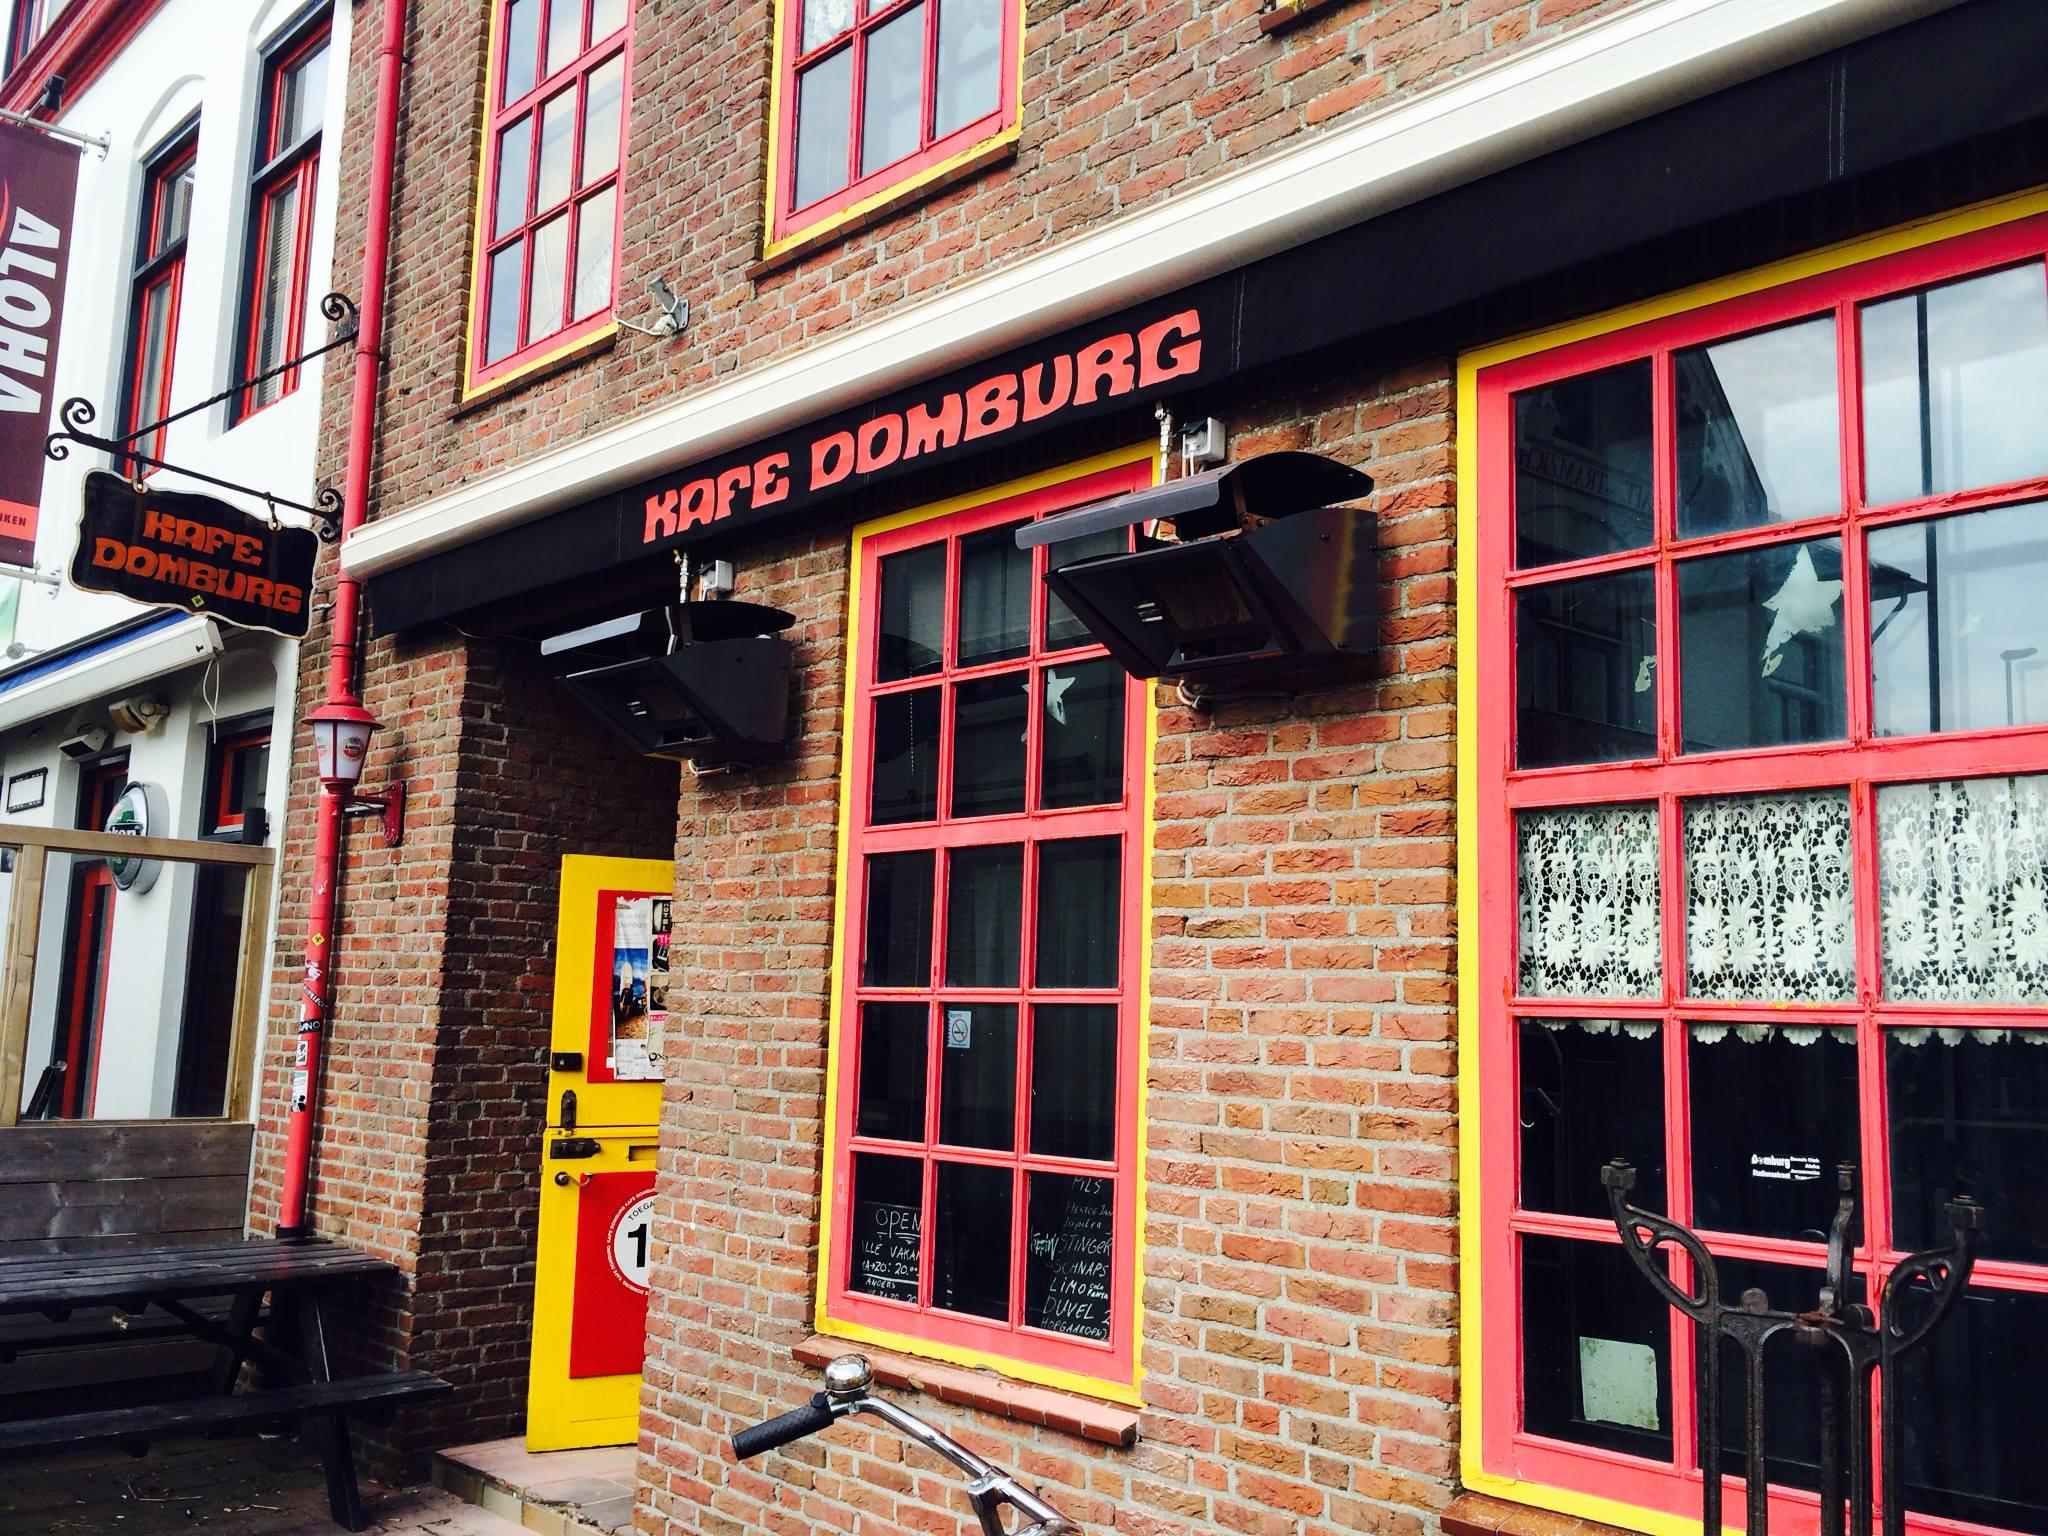 Kafe Domburg VisitDomburg - foto van voorgevel kafe Domburg